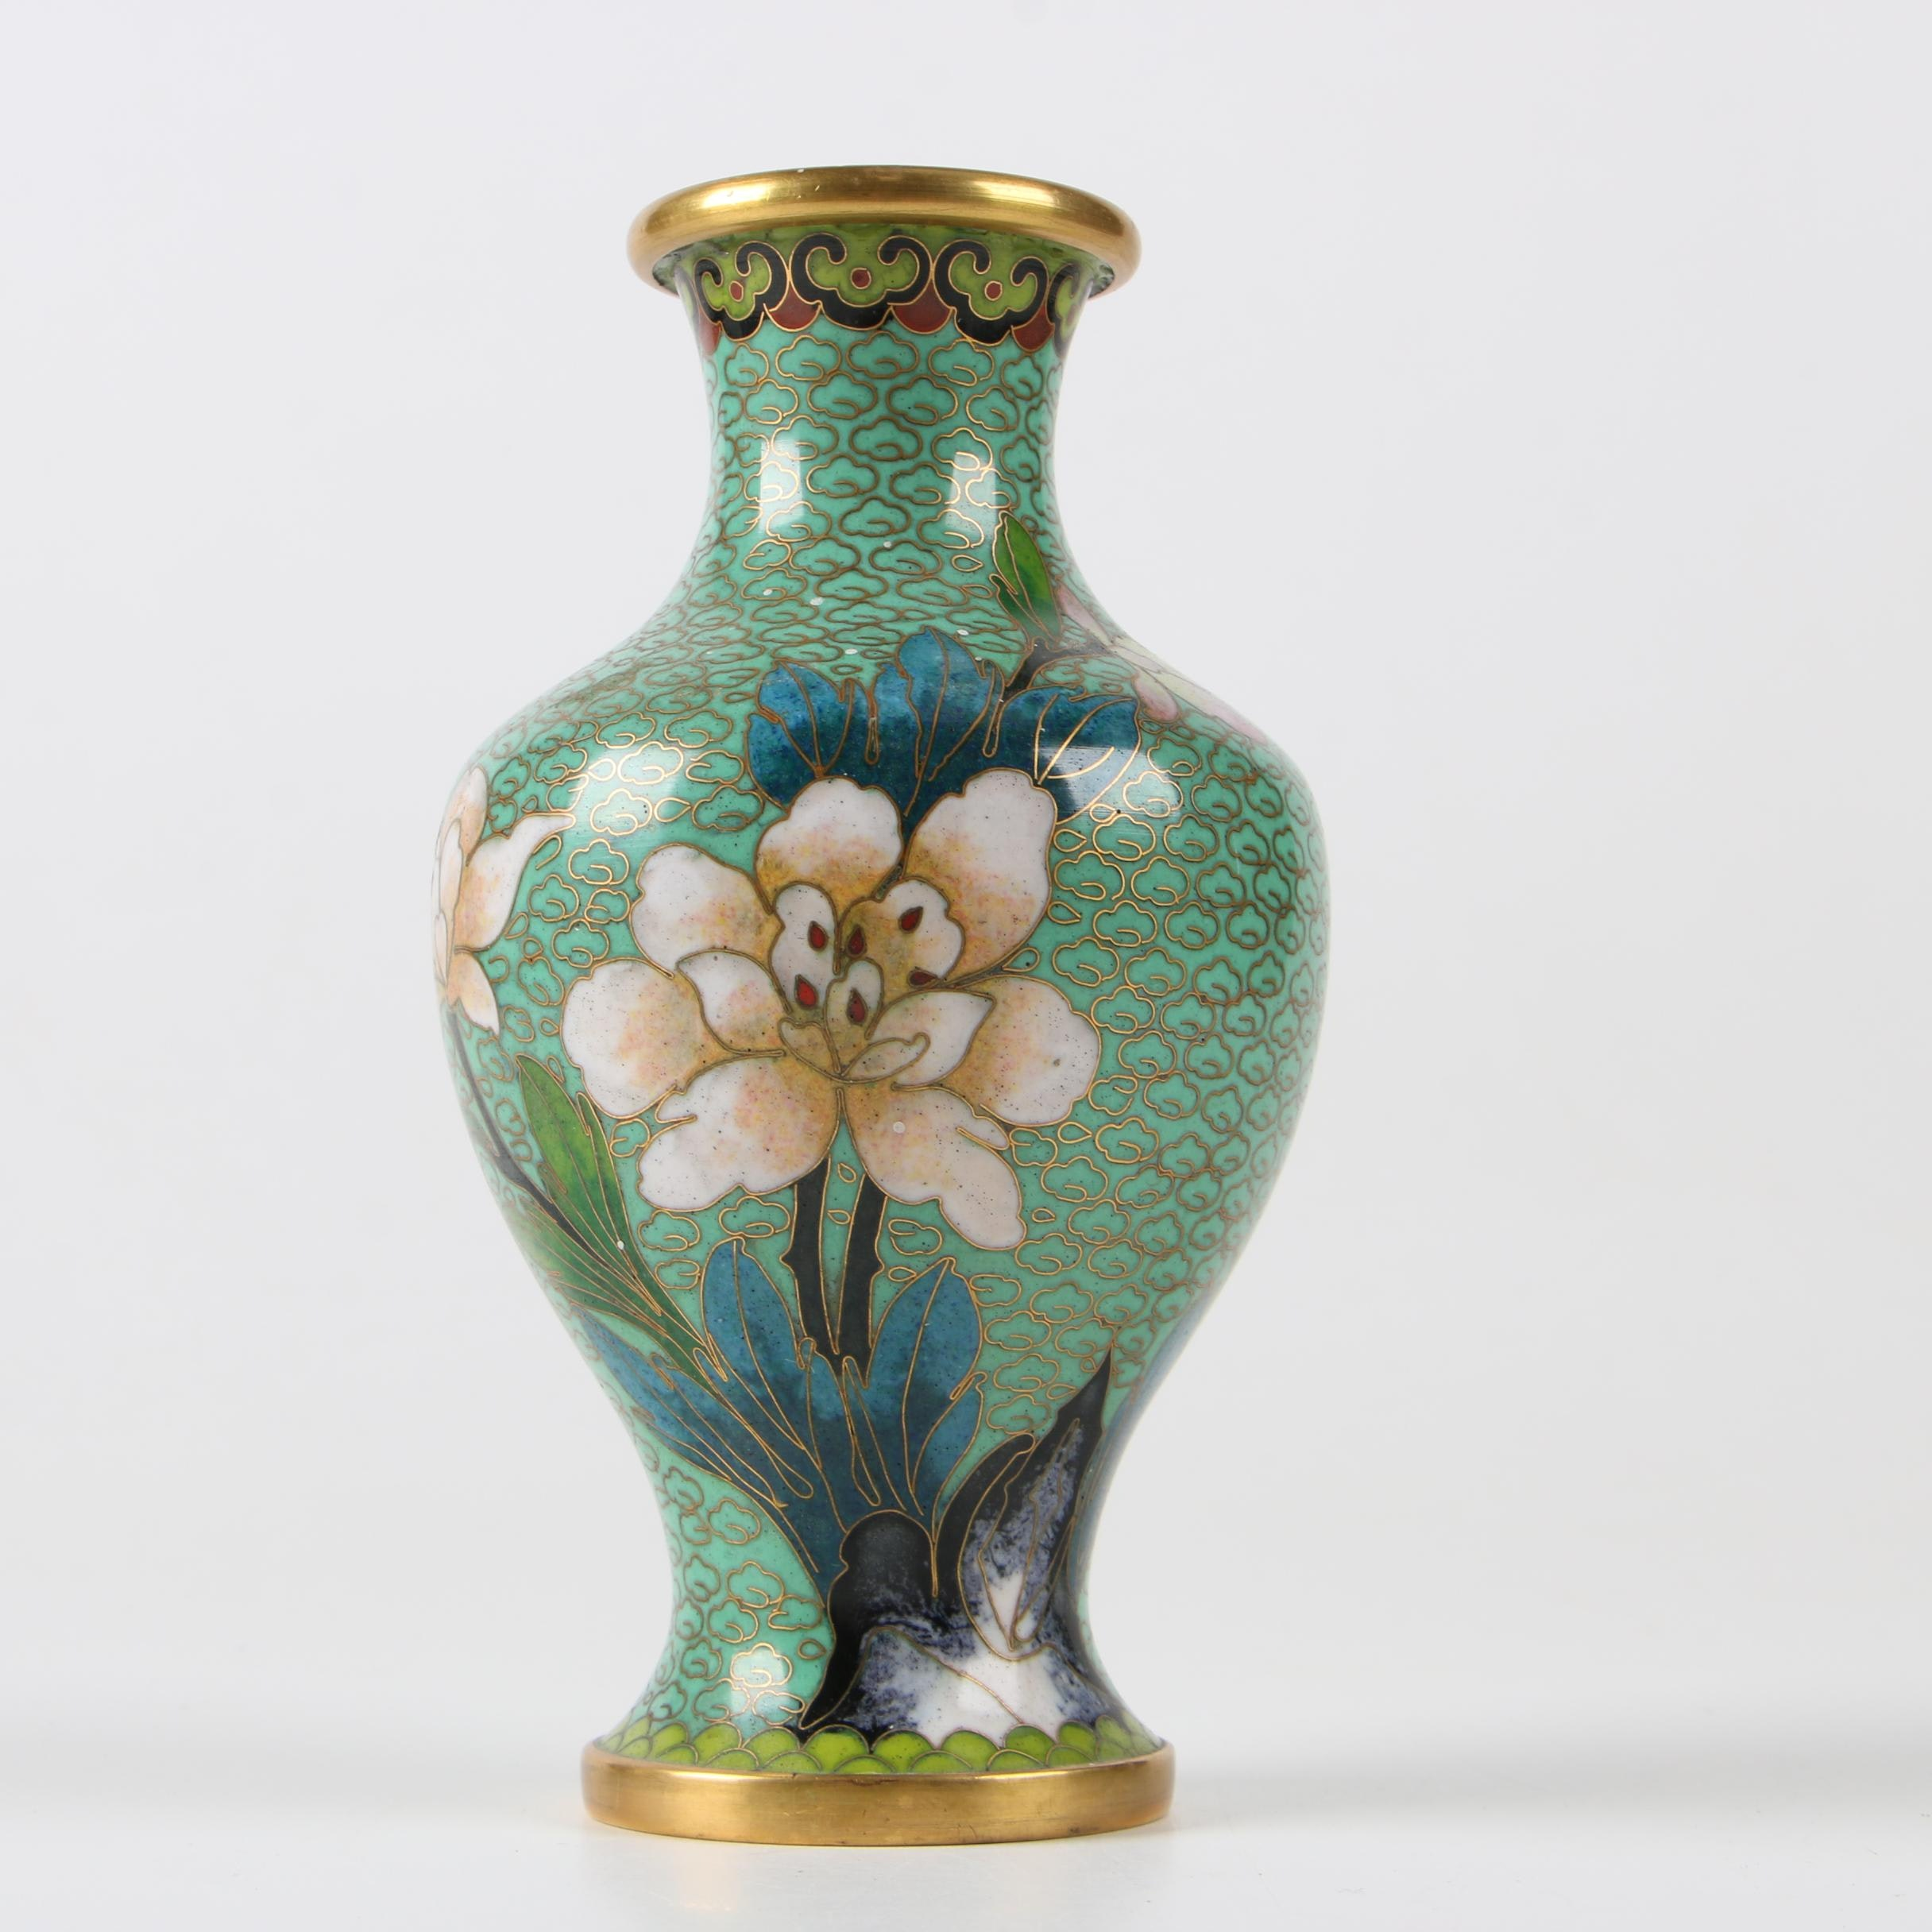 Chinese Cloisonné Bud Vase